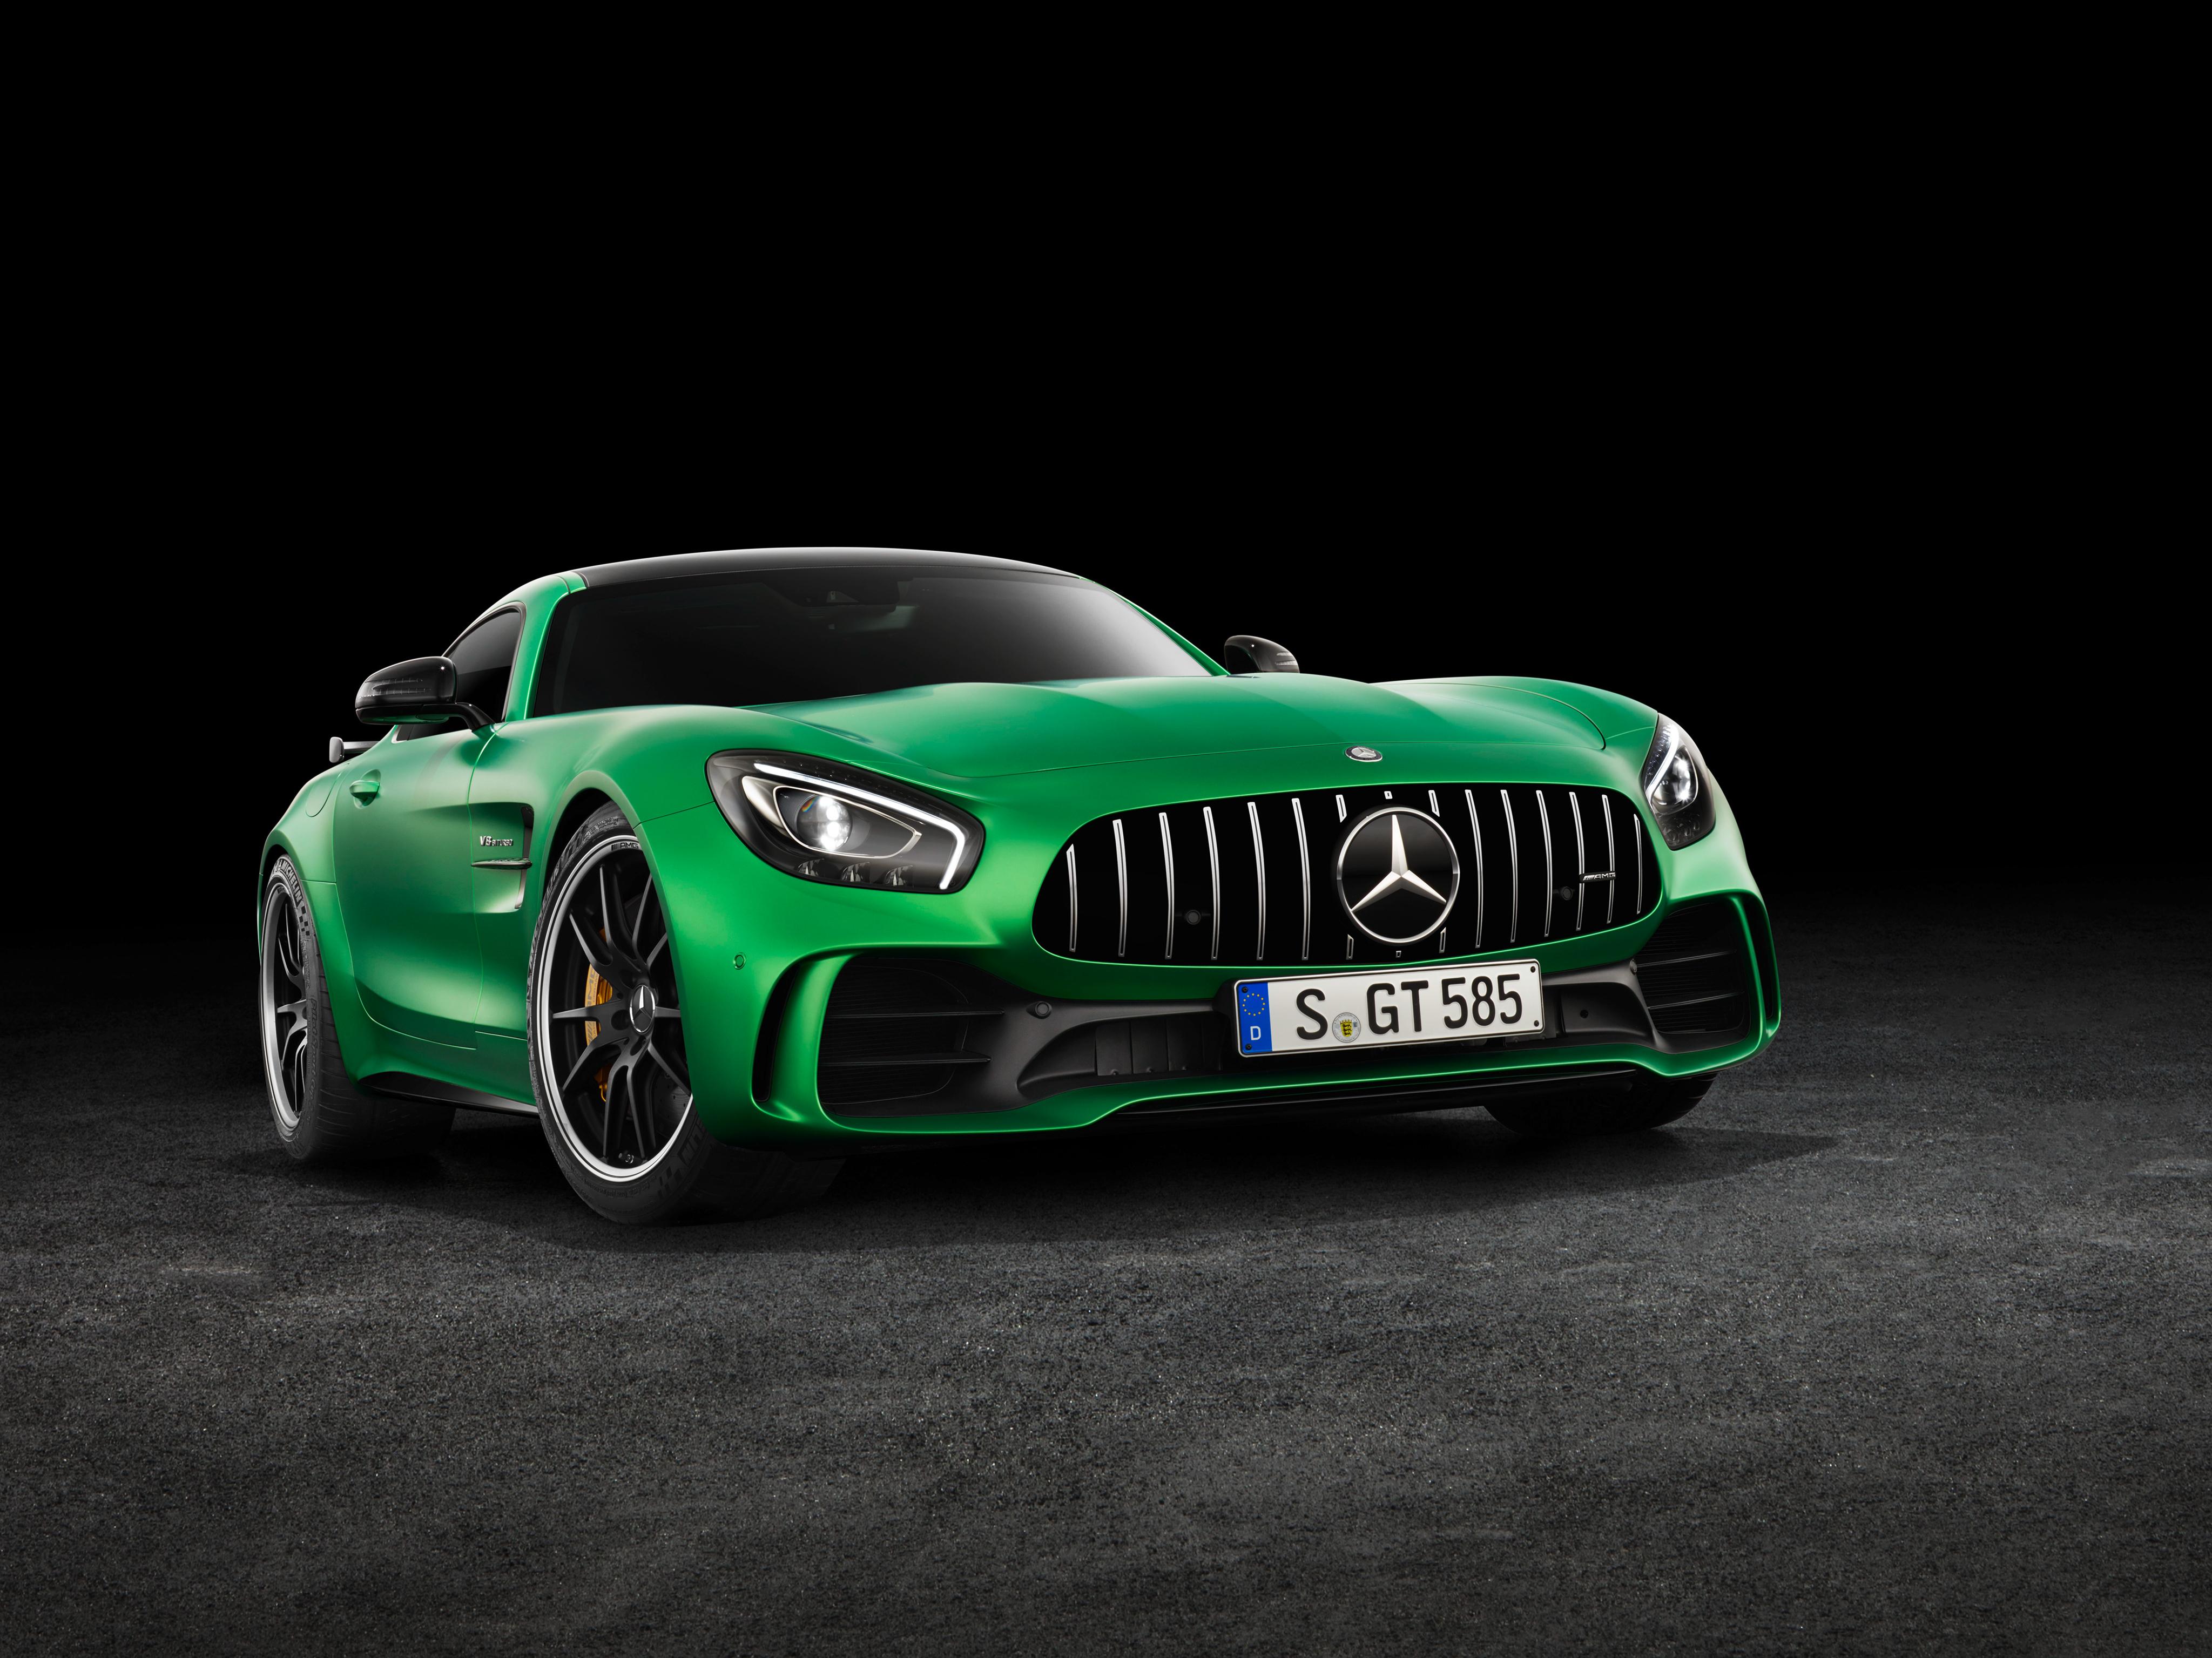 Mercedes Amg Gt 4k Ultra Hd Wallpaper Background Image